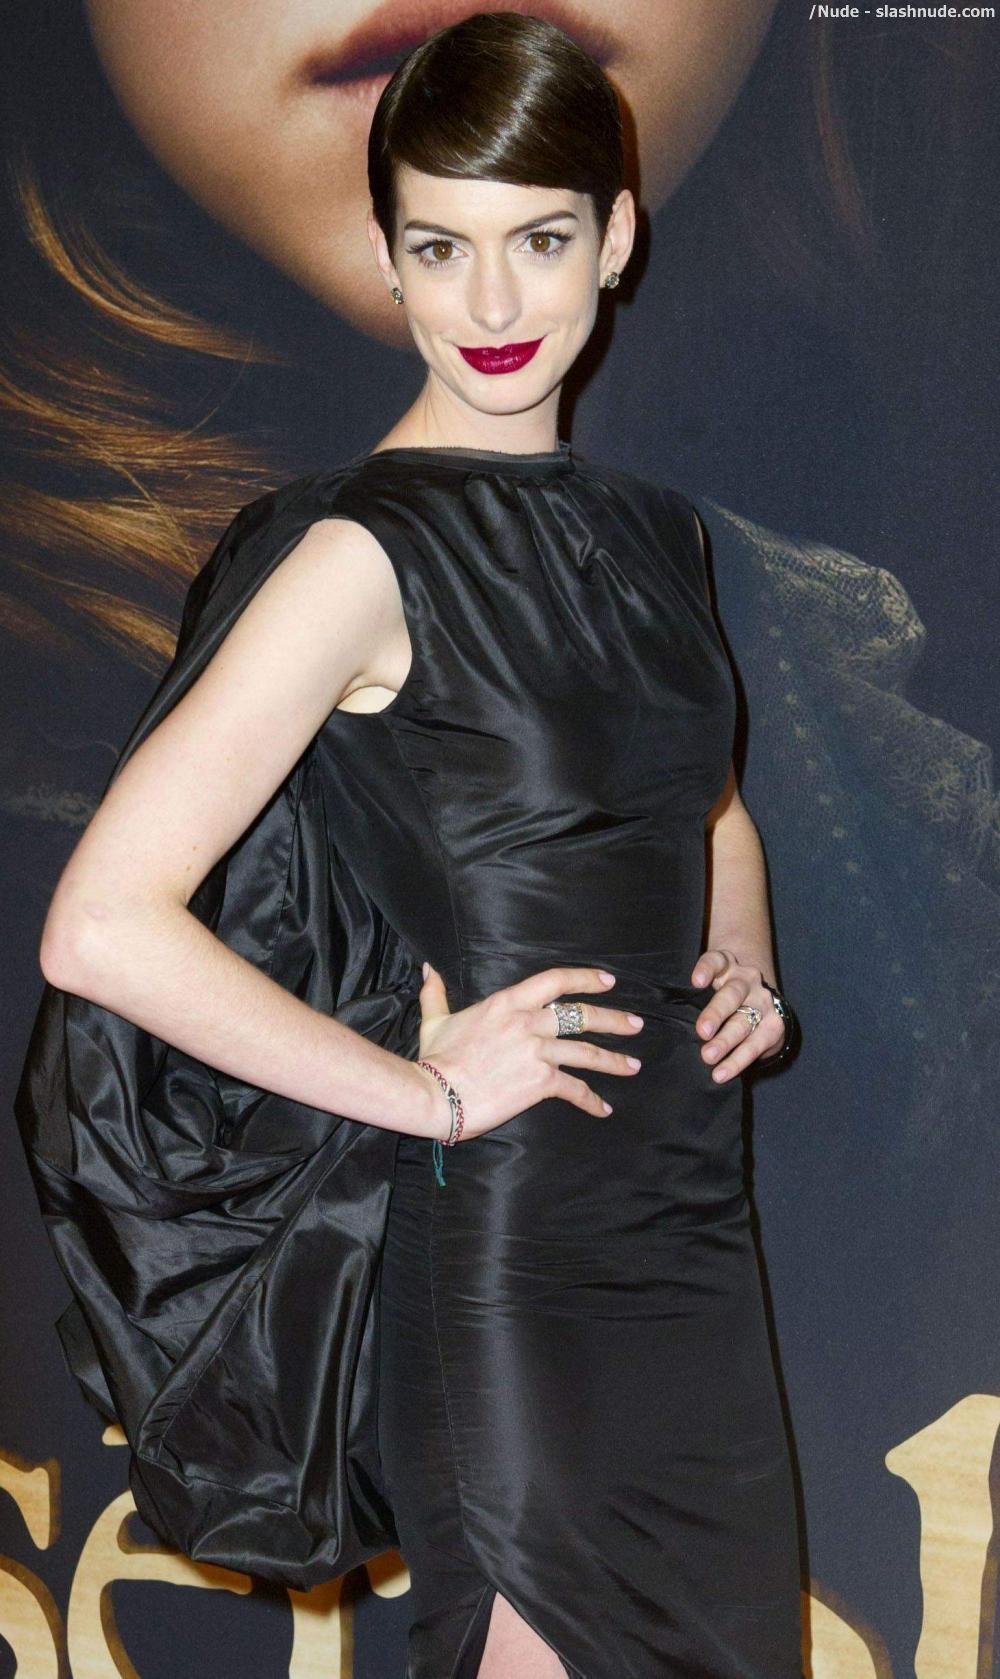 Anne Hathaway No Underwear Look Flashes Her Pussy 4